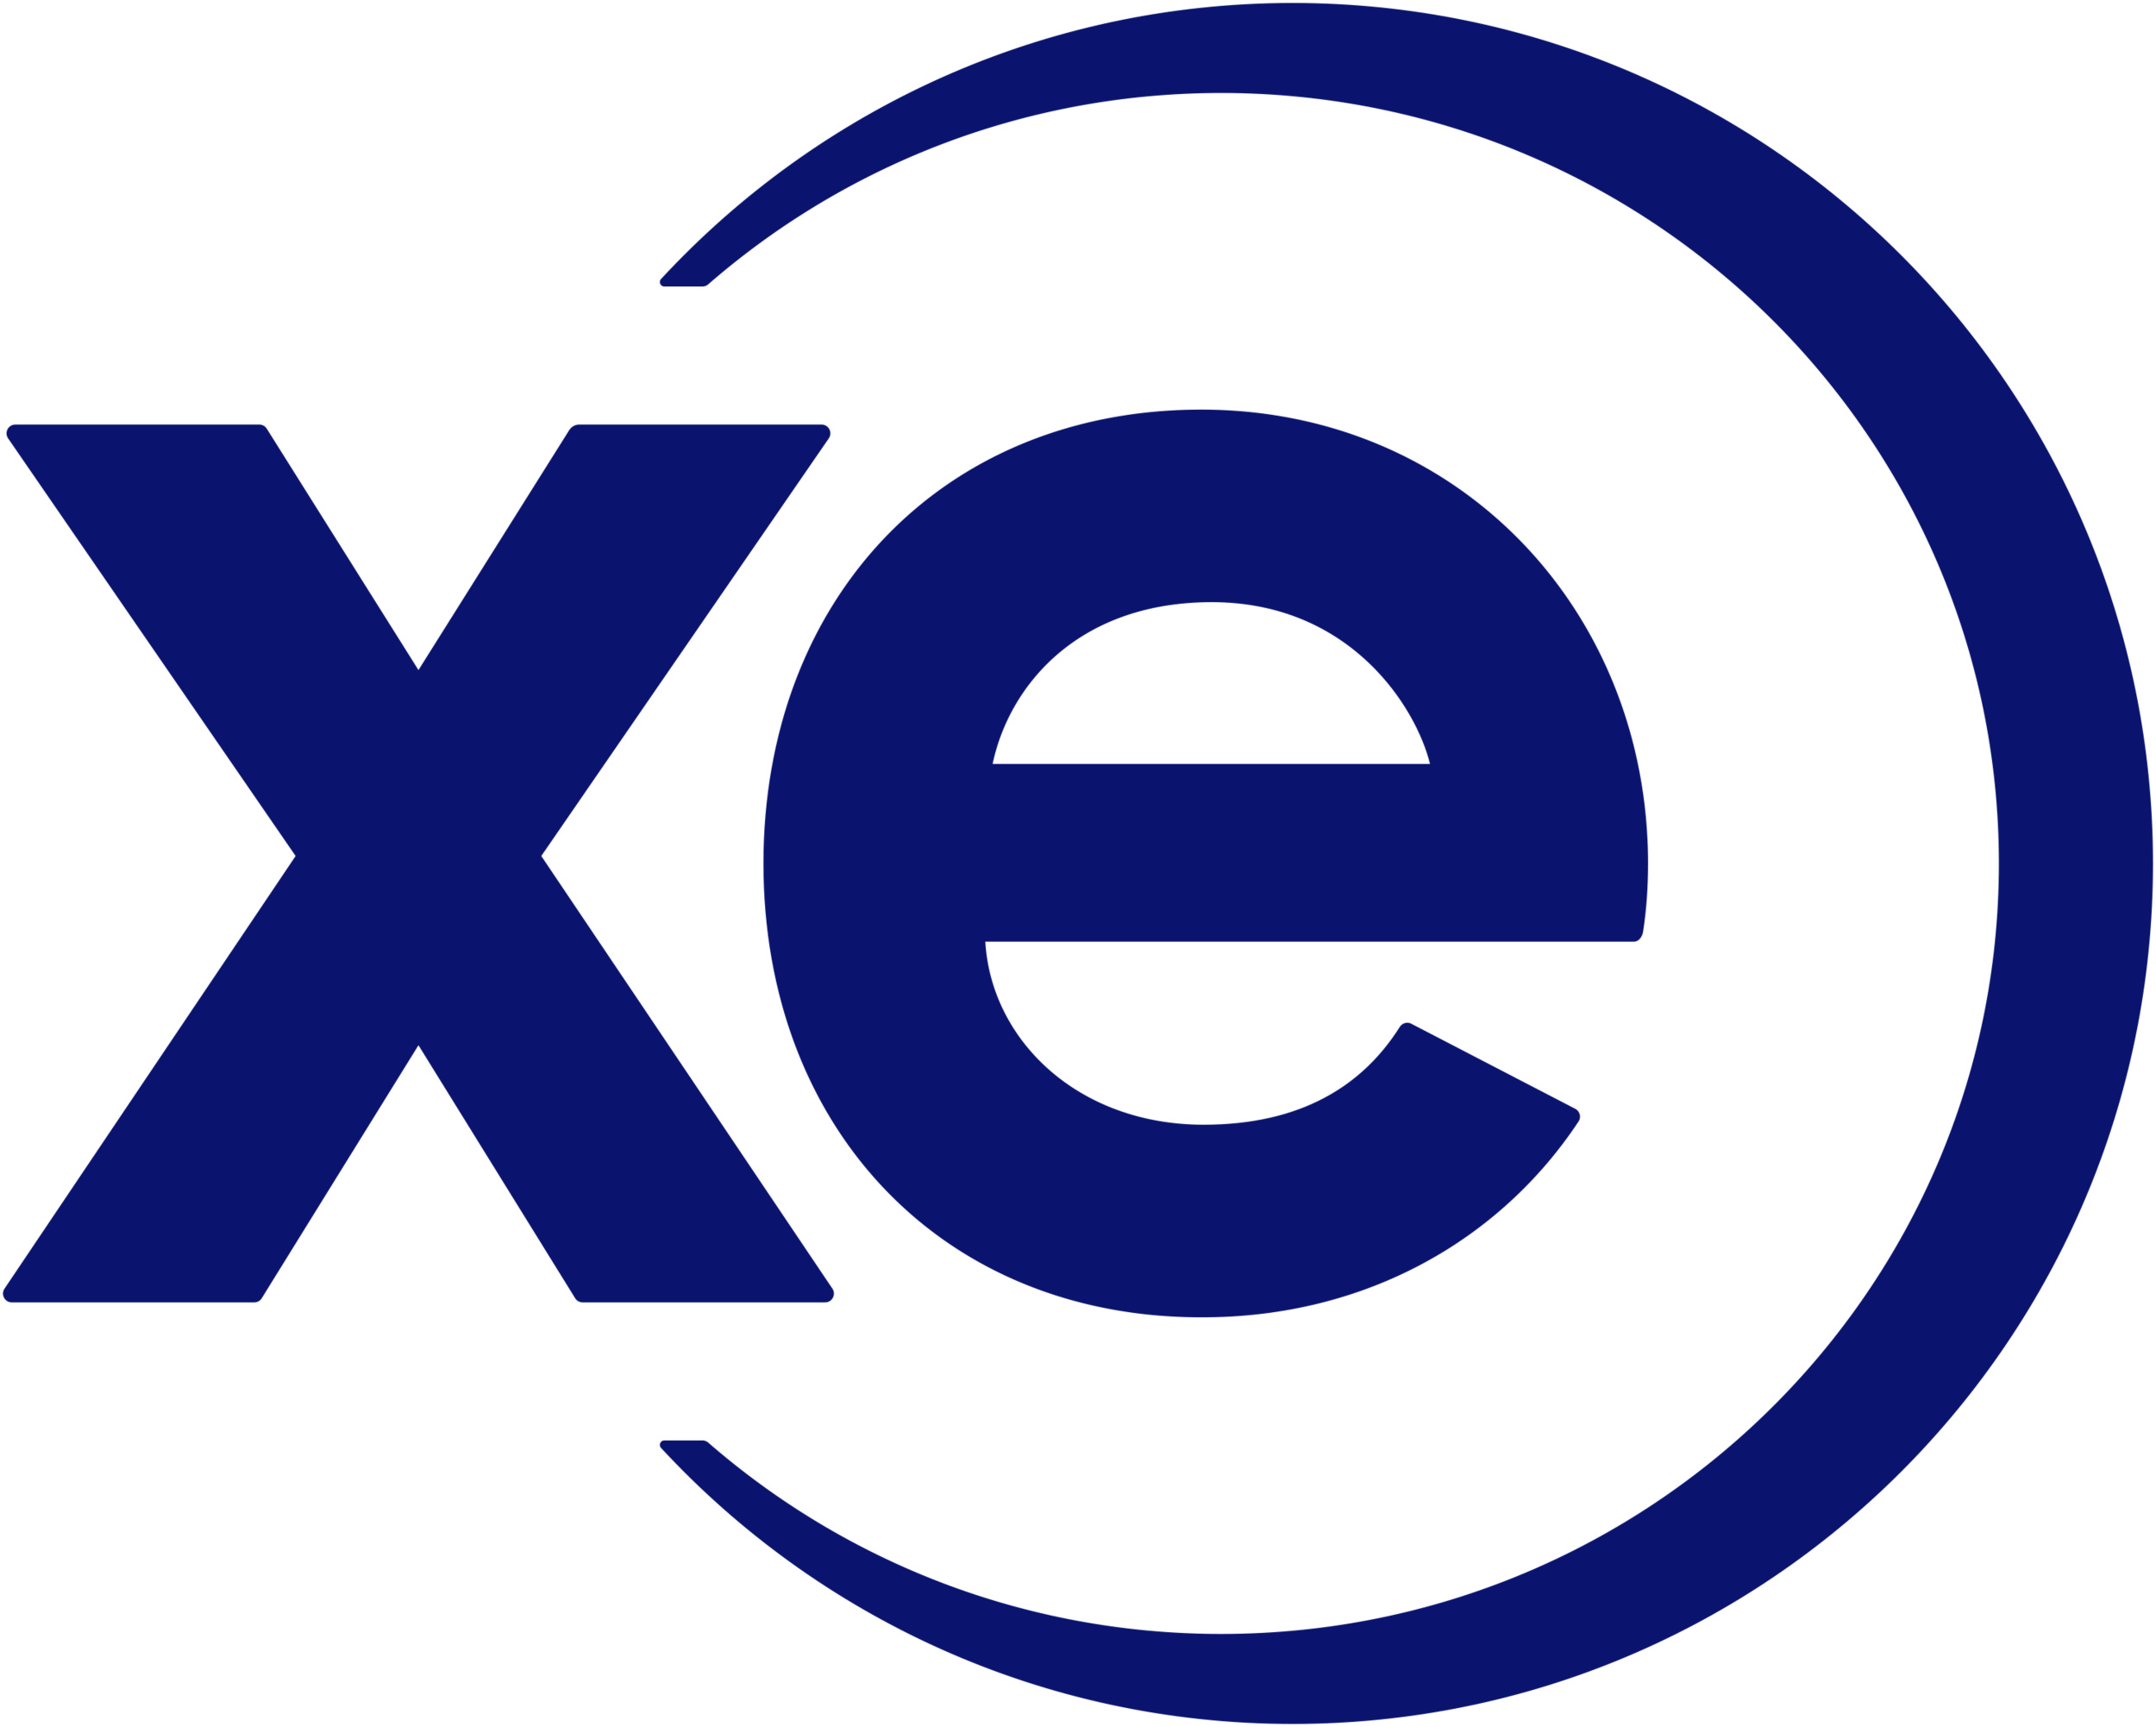 XE+%E2%80%93+Logo+%E2%80%93+Blue+%28RGB%29.jpg